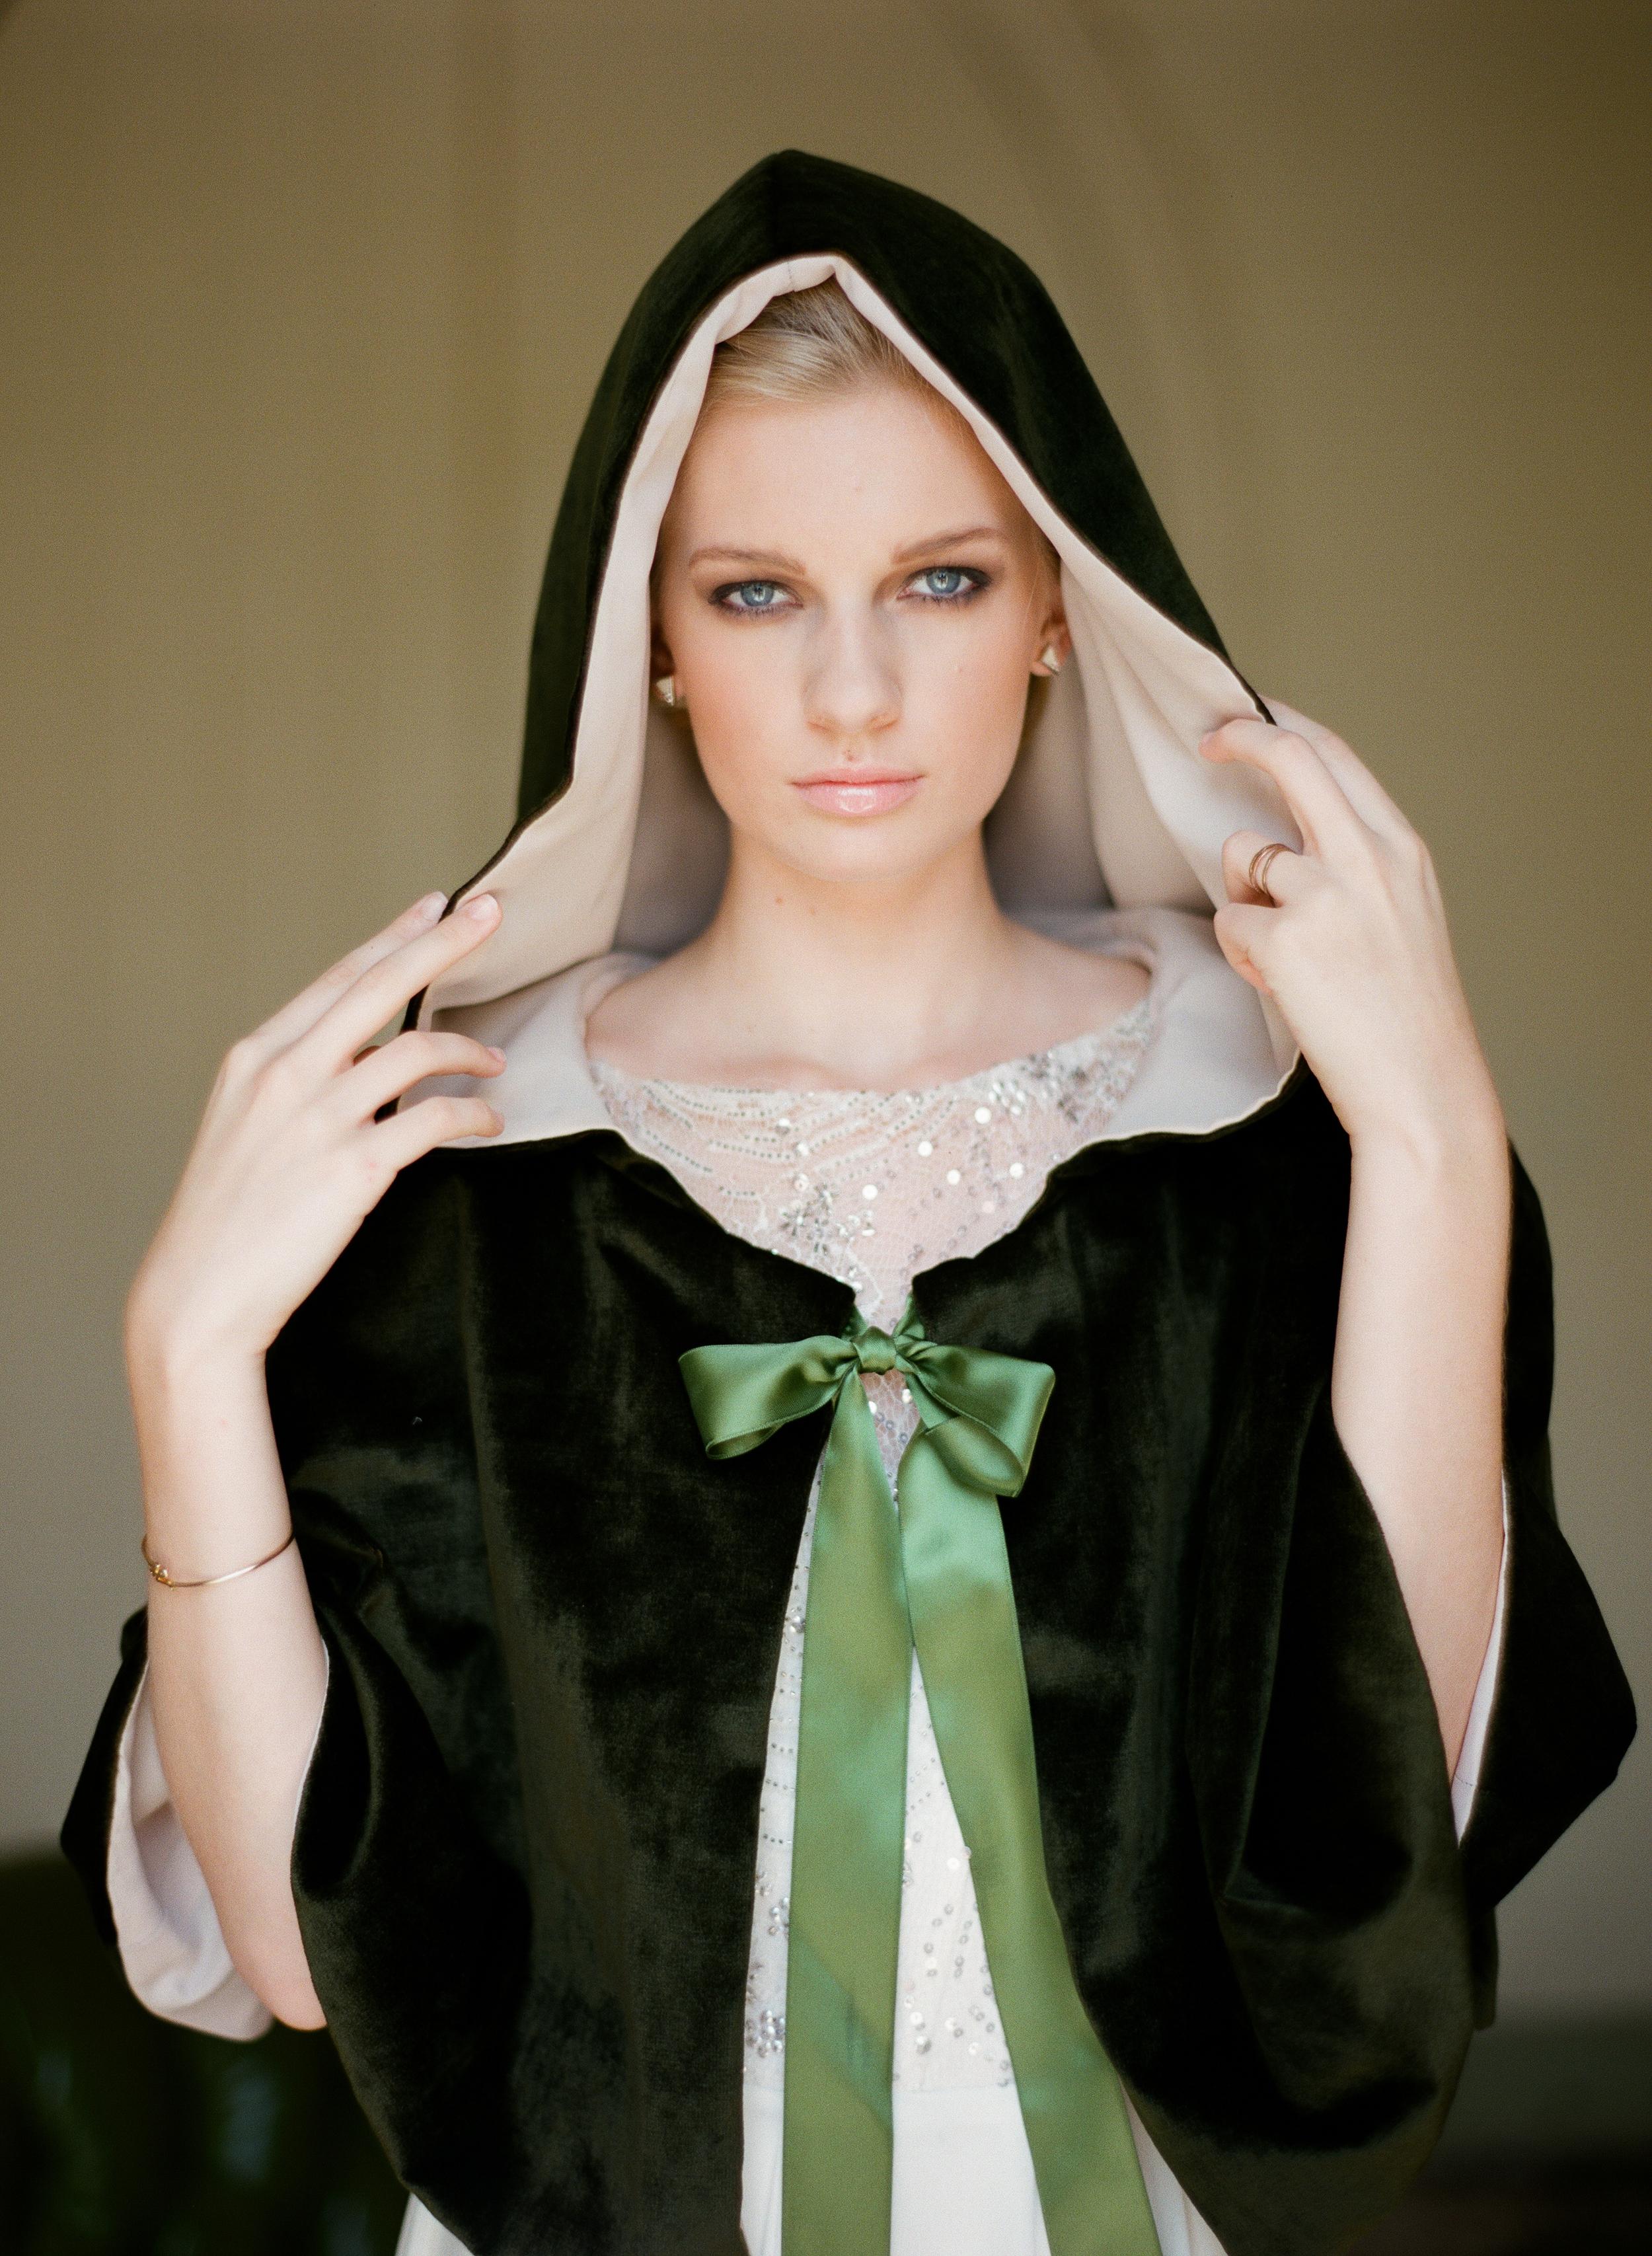 Olivia-Griffin-trendy-bride-magazine-willow-florals-sarah-seven-gwen-ivory-and-beau-bridal-boutique-savannah-wedding-dresses-savannah-bridal-boutique-savannah-wedding-savannah-bridal-gowns-savannah-wedding-planner-georgia-bridal-boutique-10.JPG